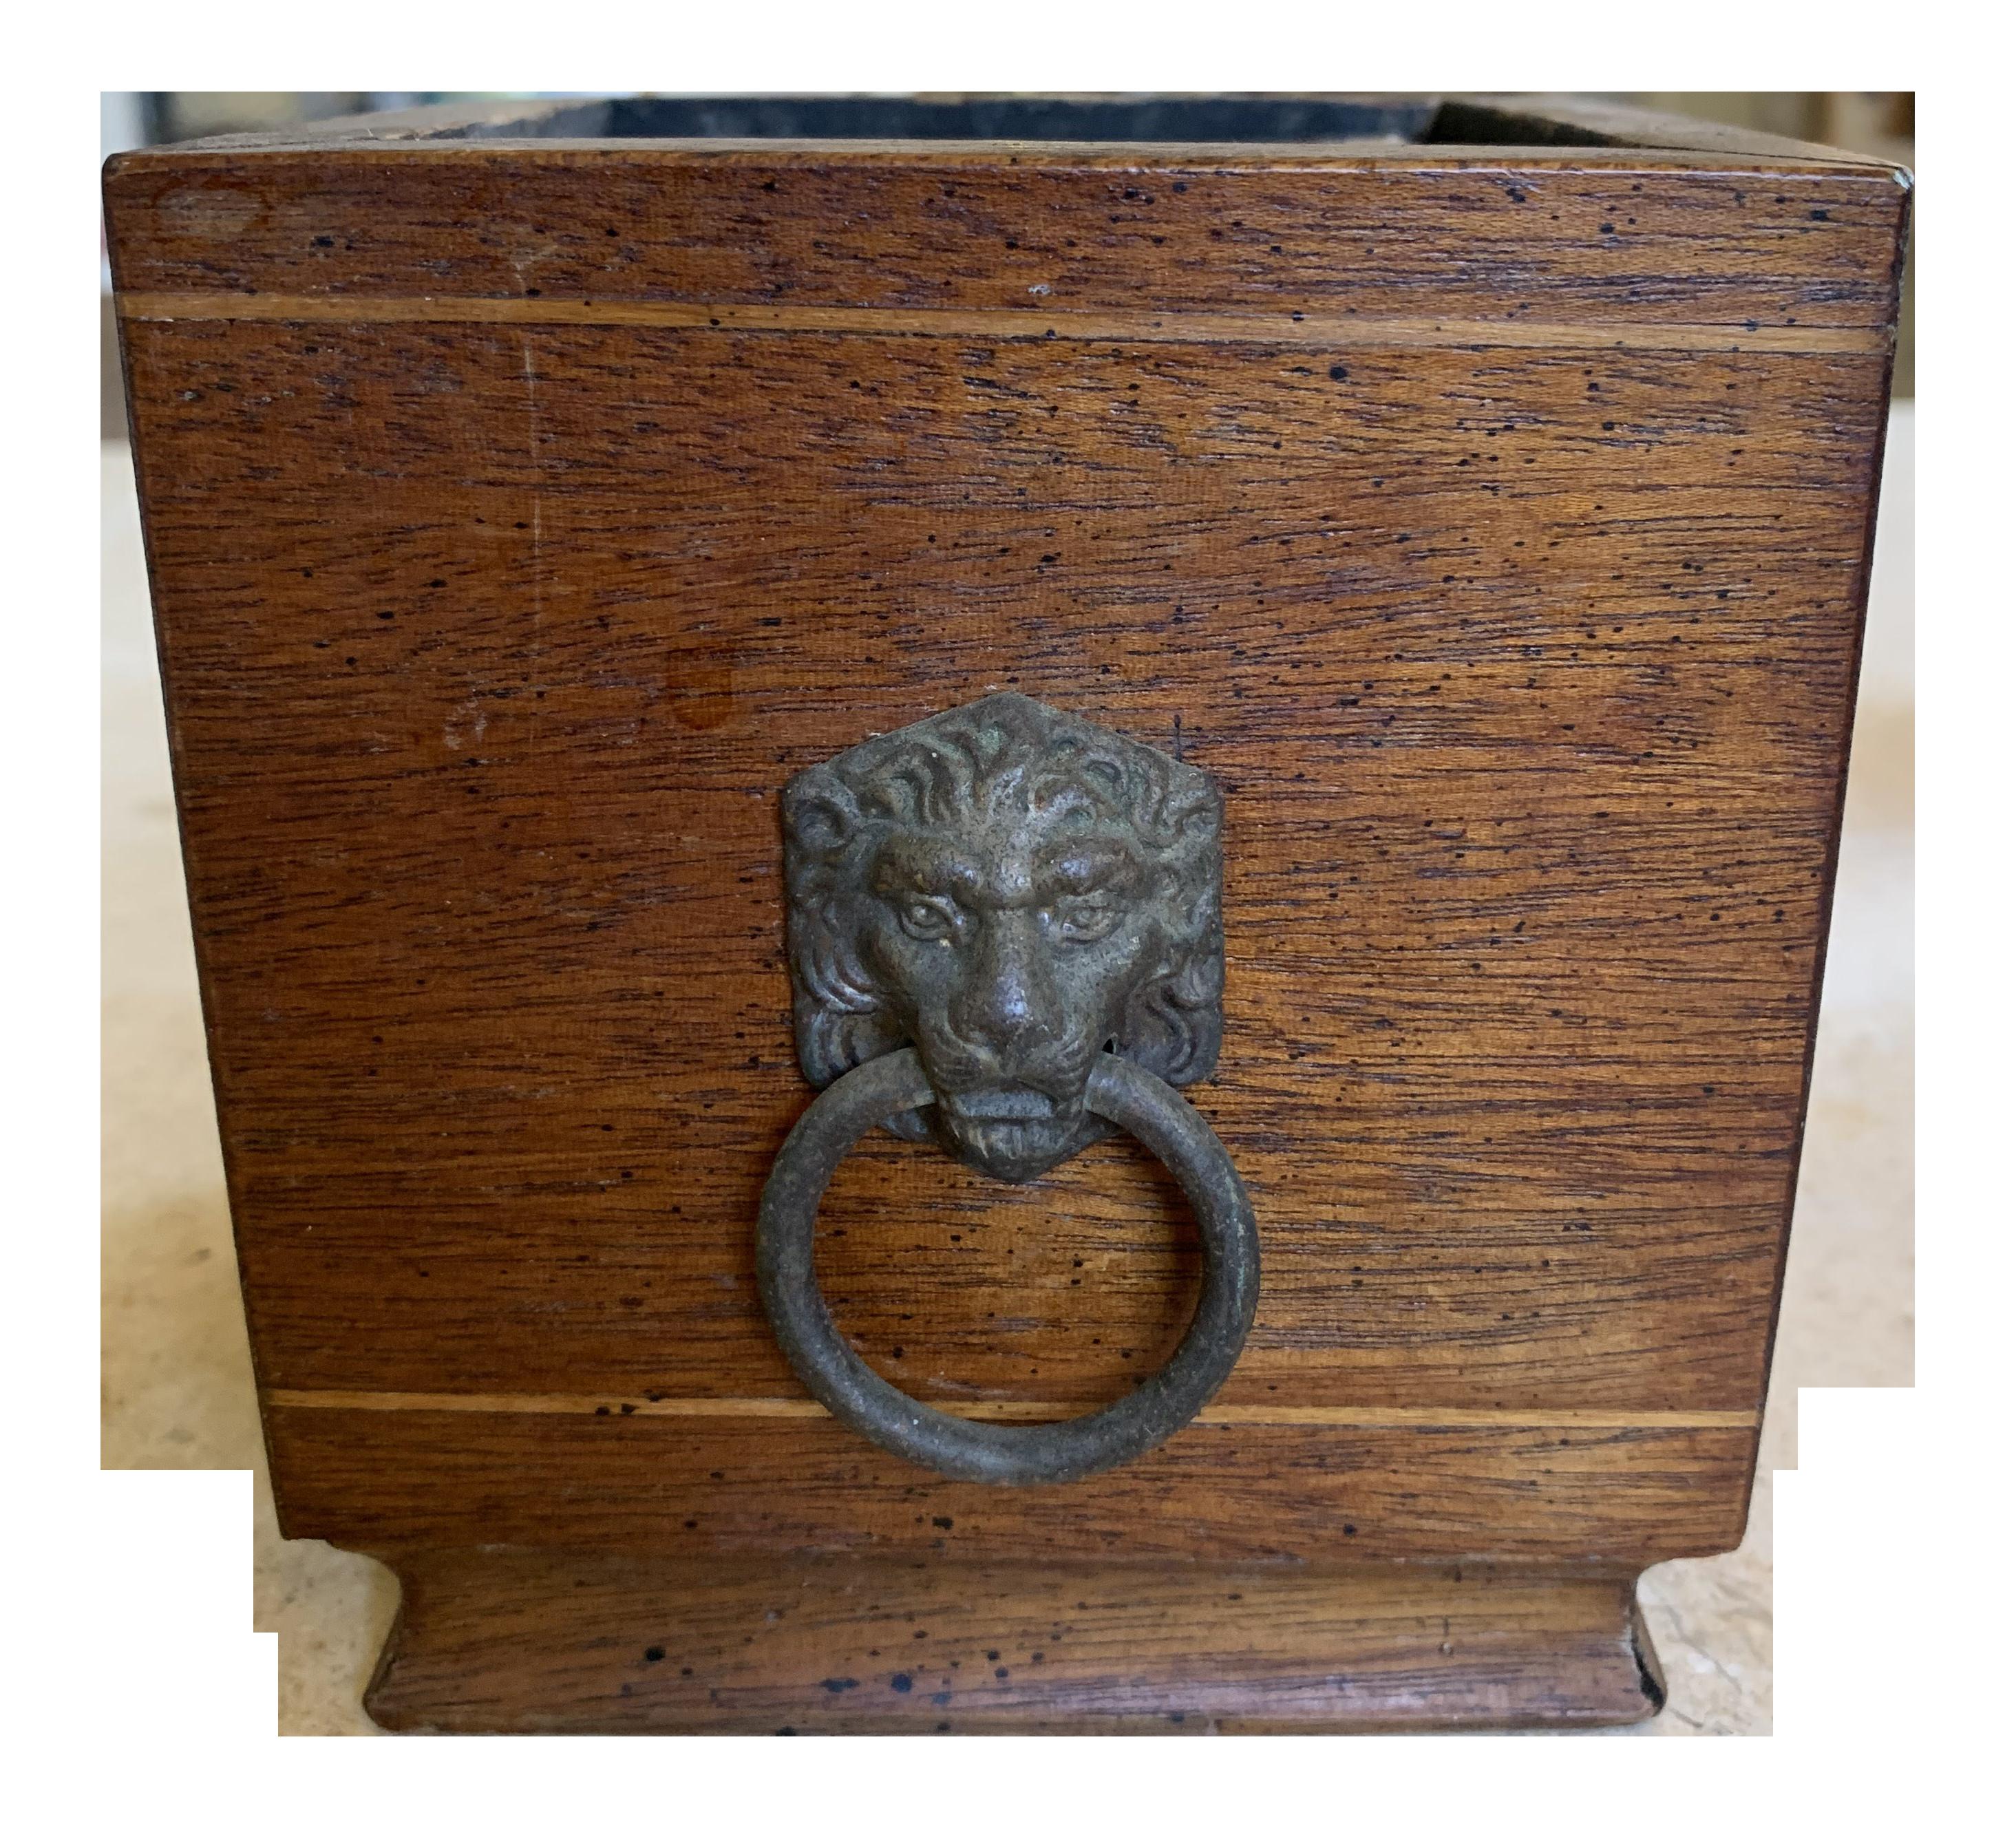 19th Century English Wood Planter Chairish